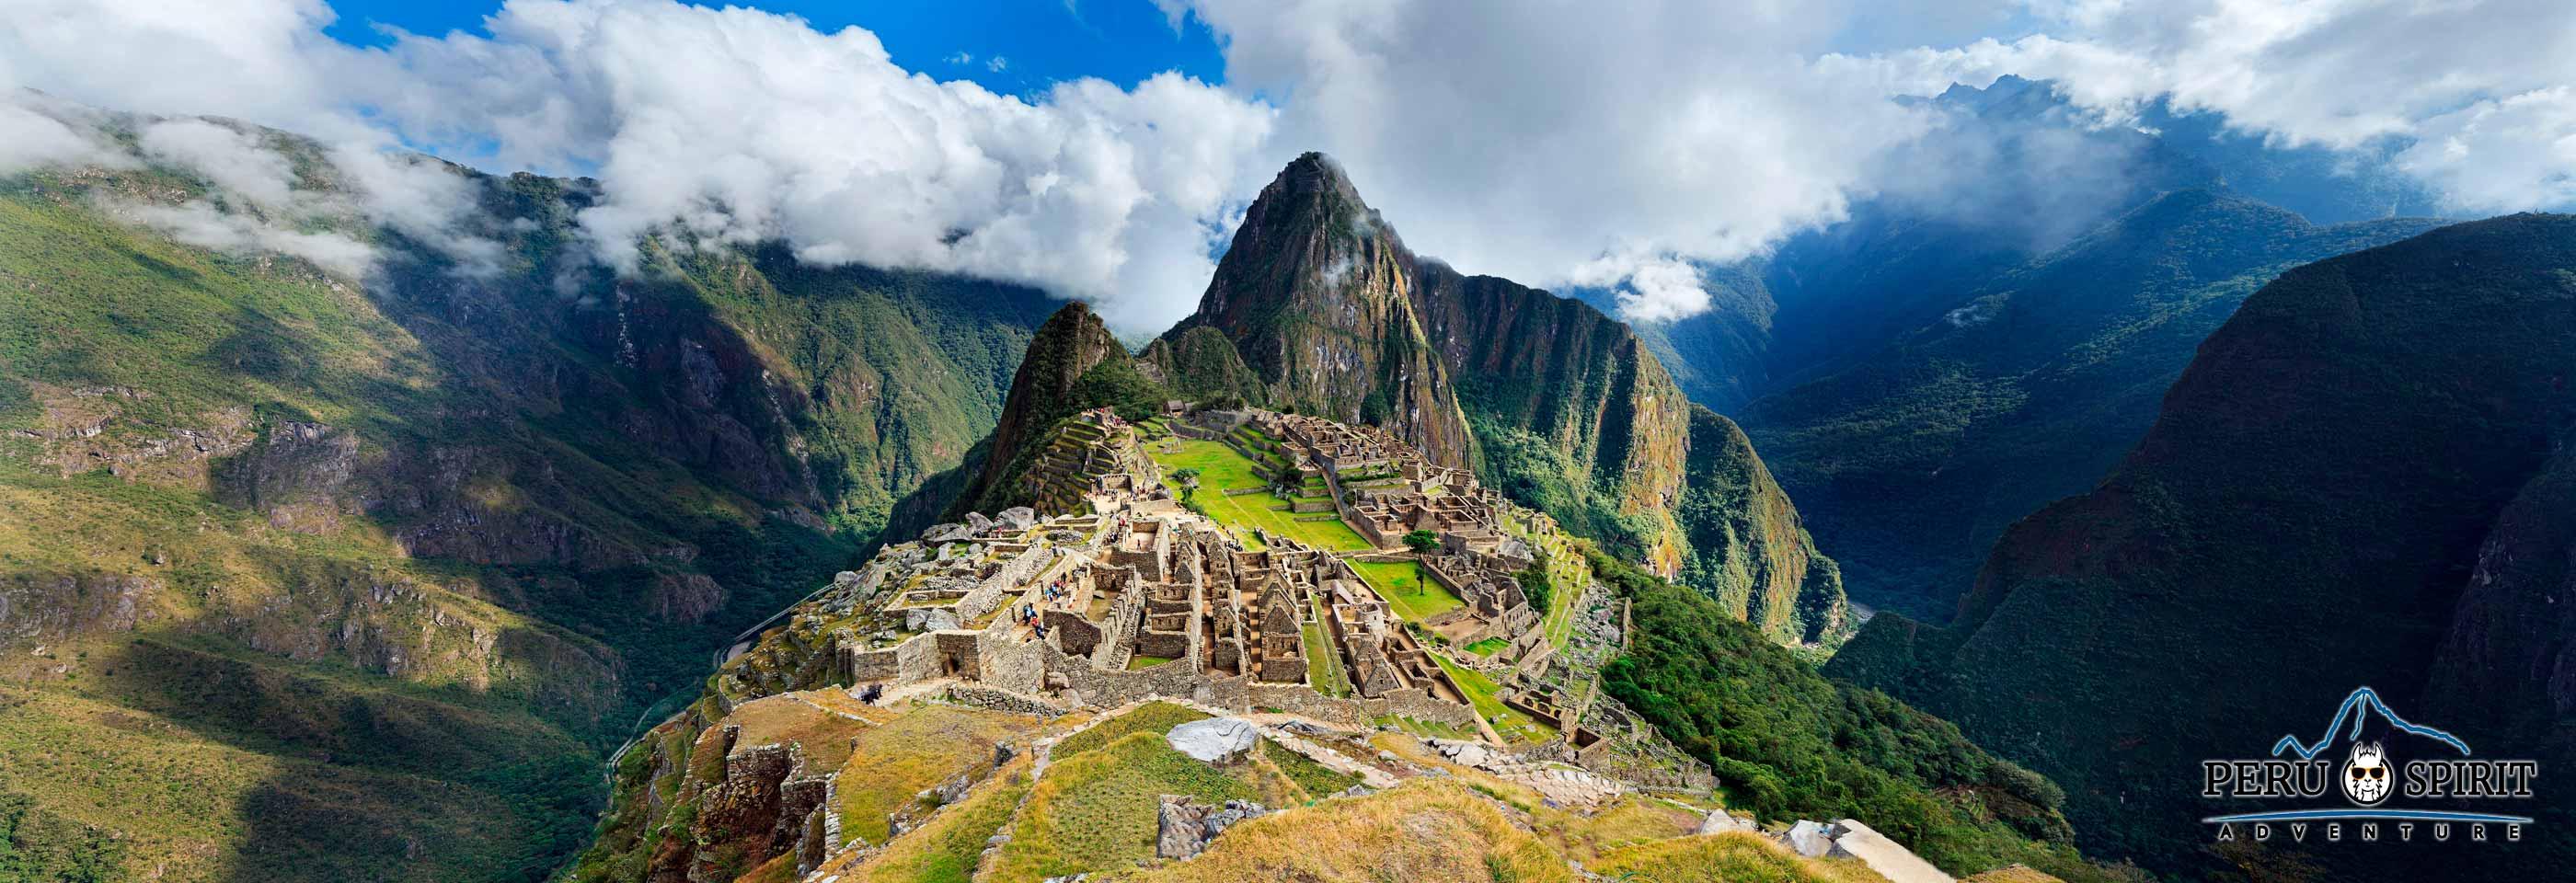 Machu-Picchu-Full-Day